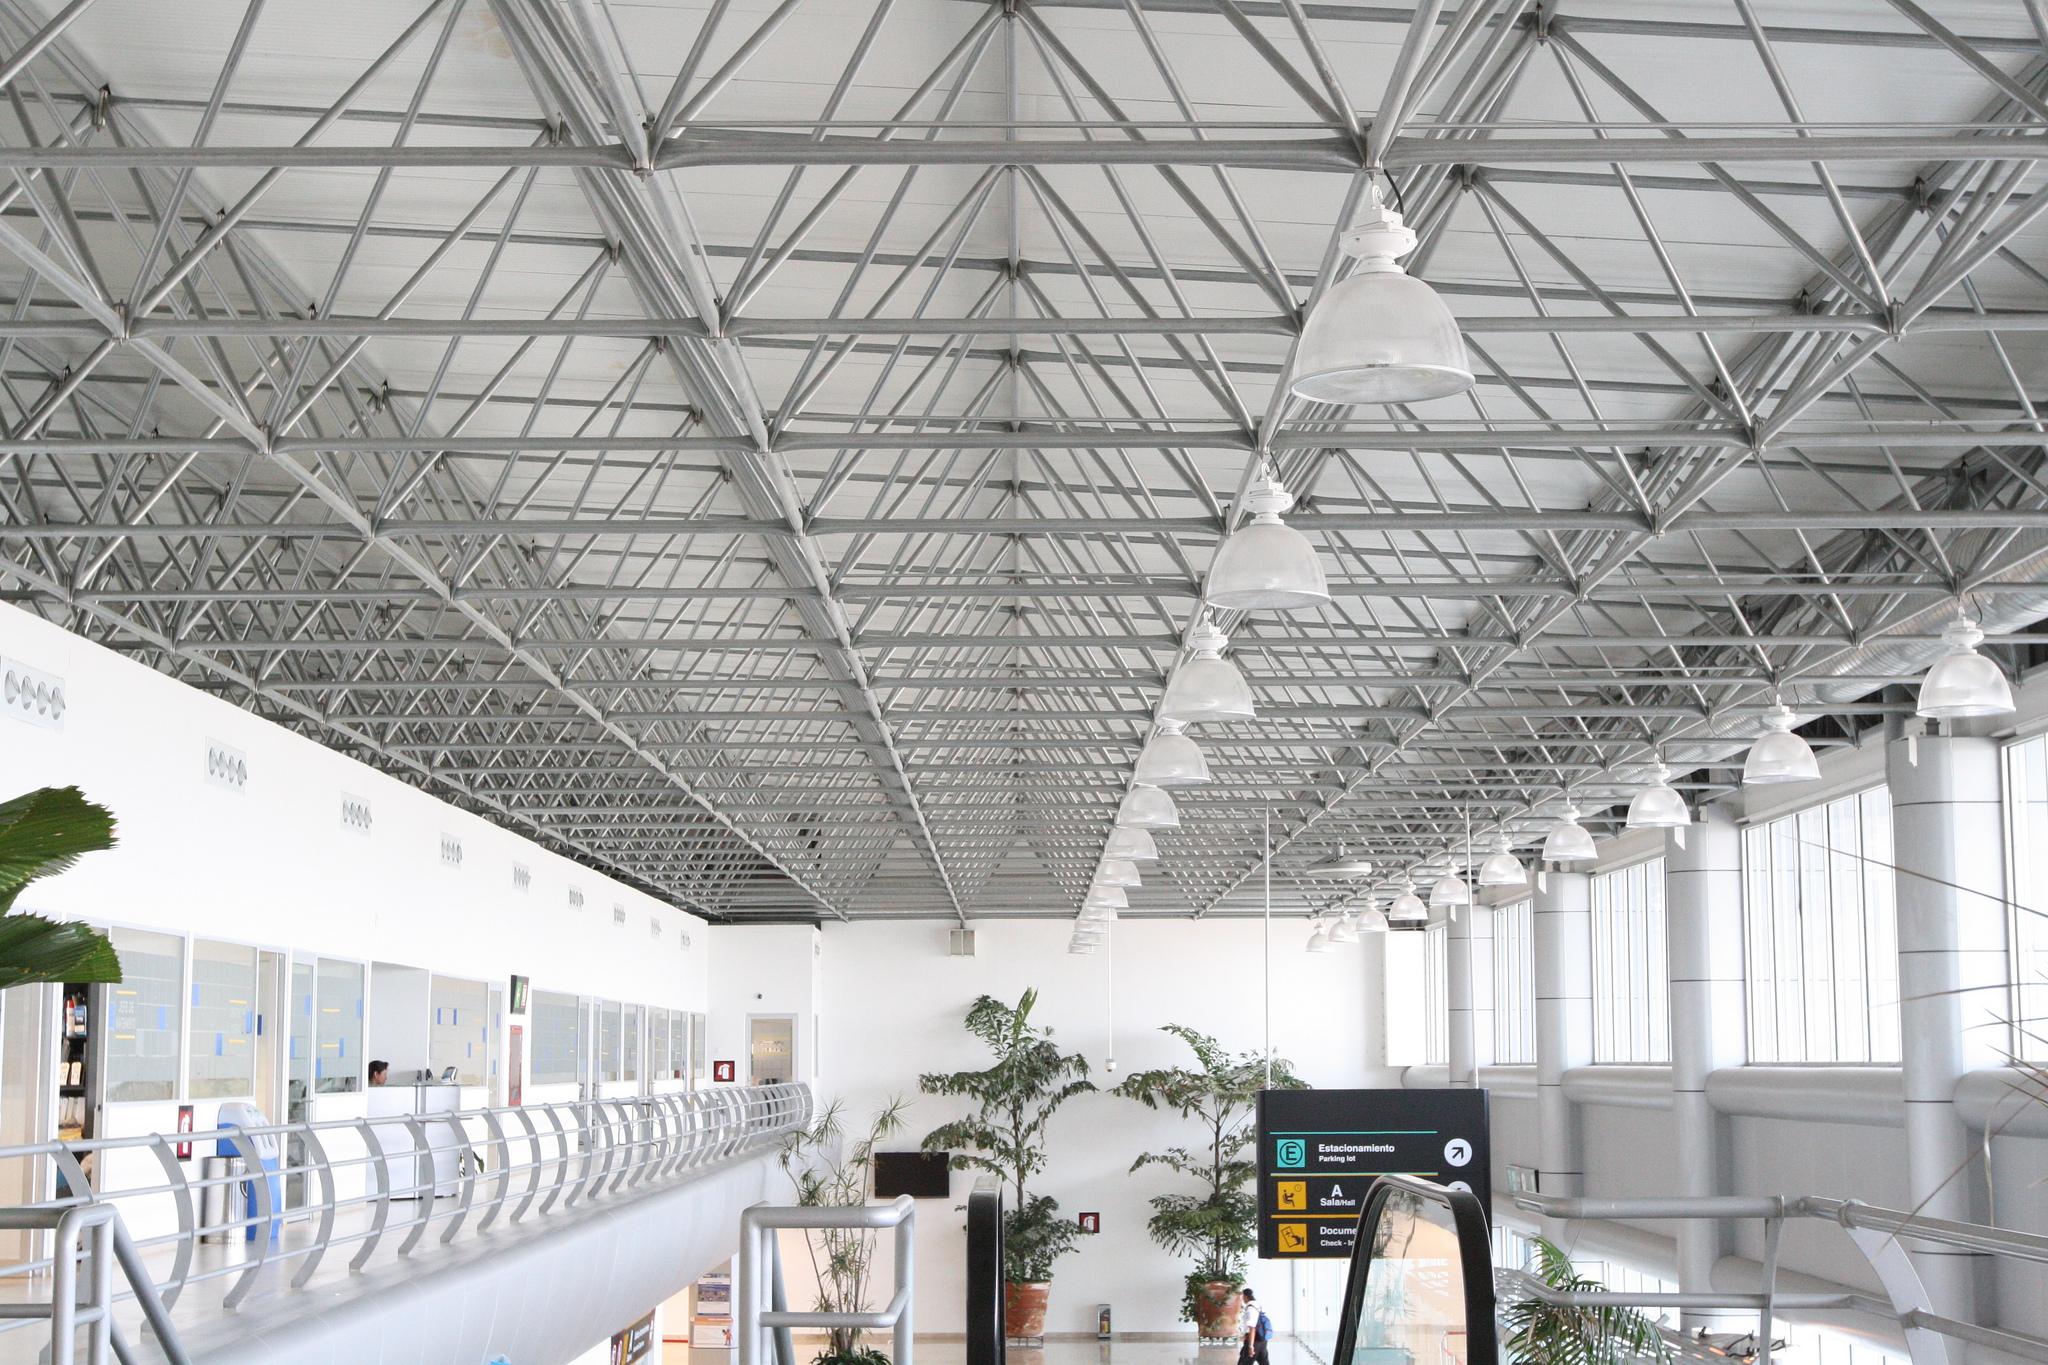 The Cuernavaca Airport exemplifies spaceframe design that helps airport travelers reach their destinations.